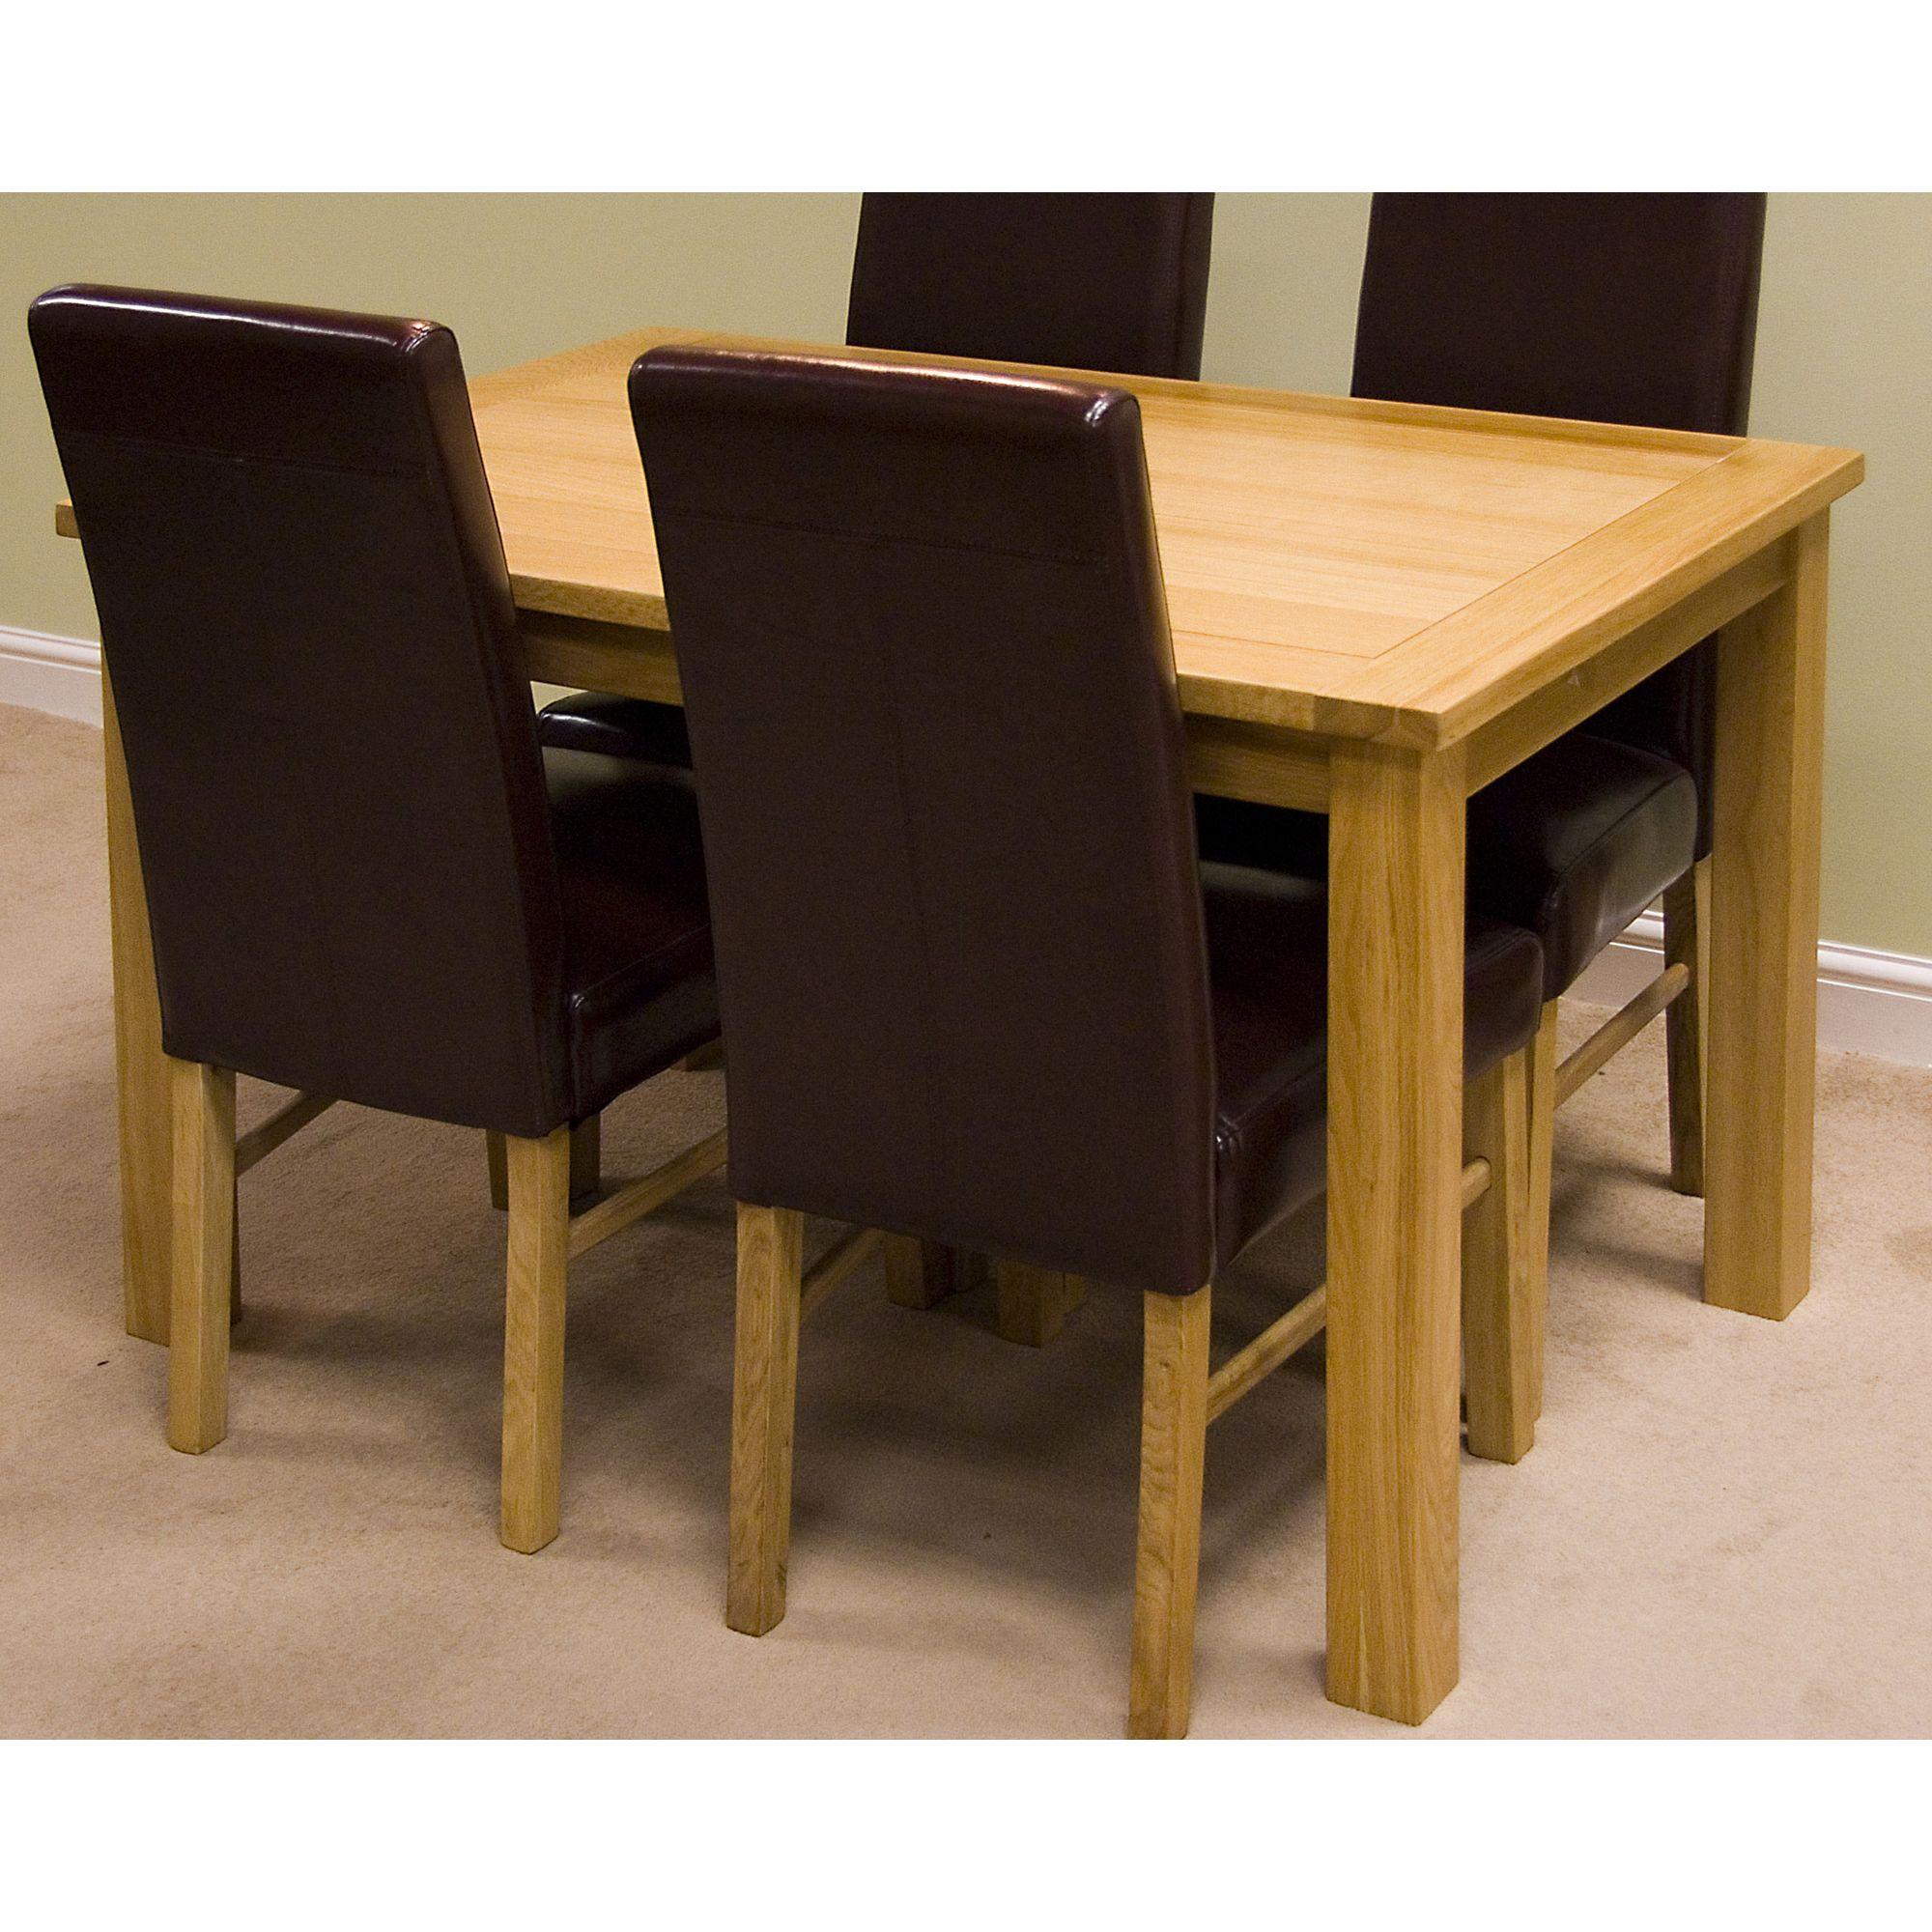 G&P Furniture Rectangular Fixed Top Oak Dining Table